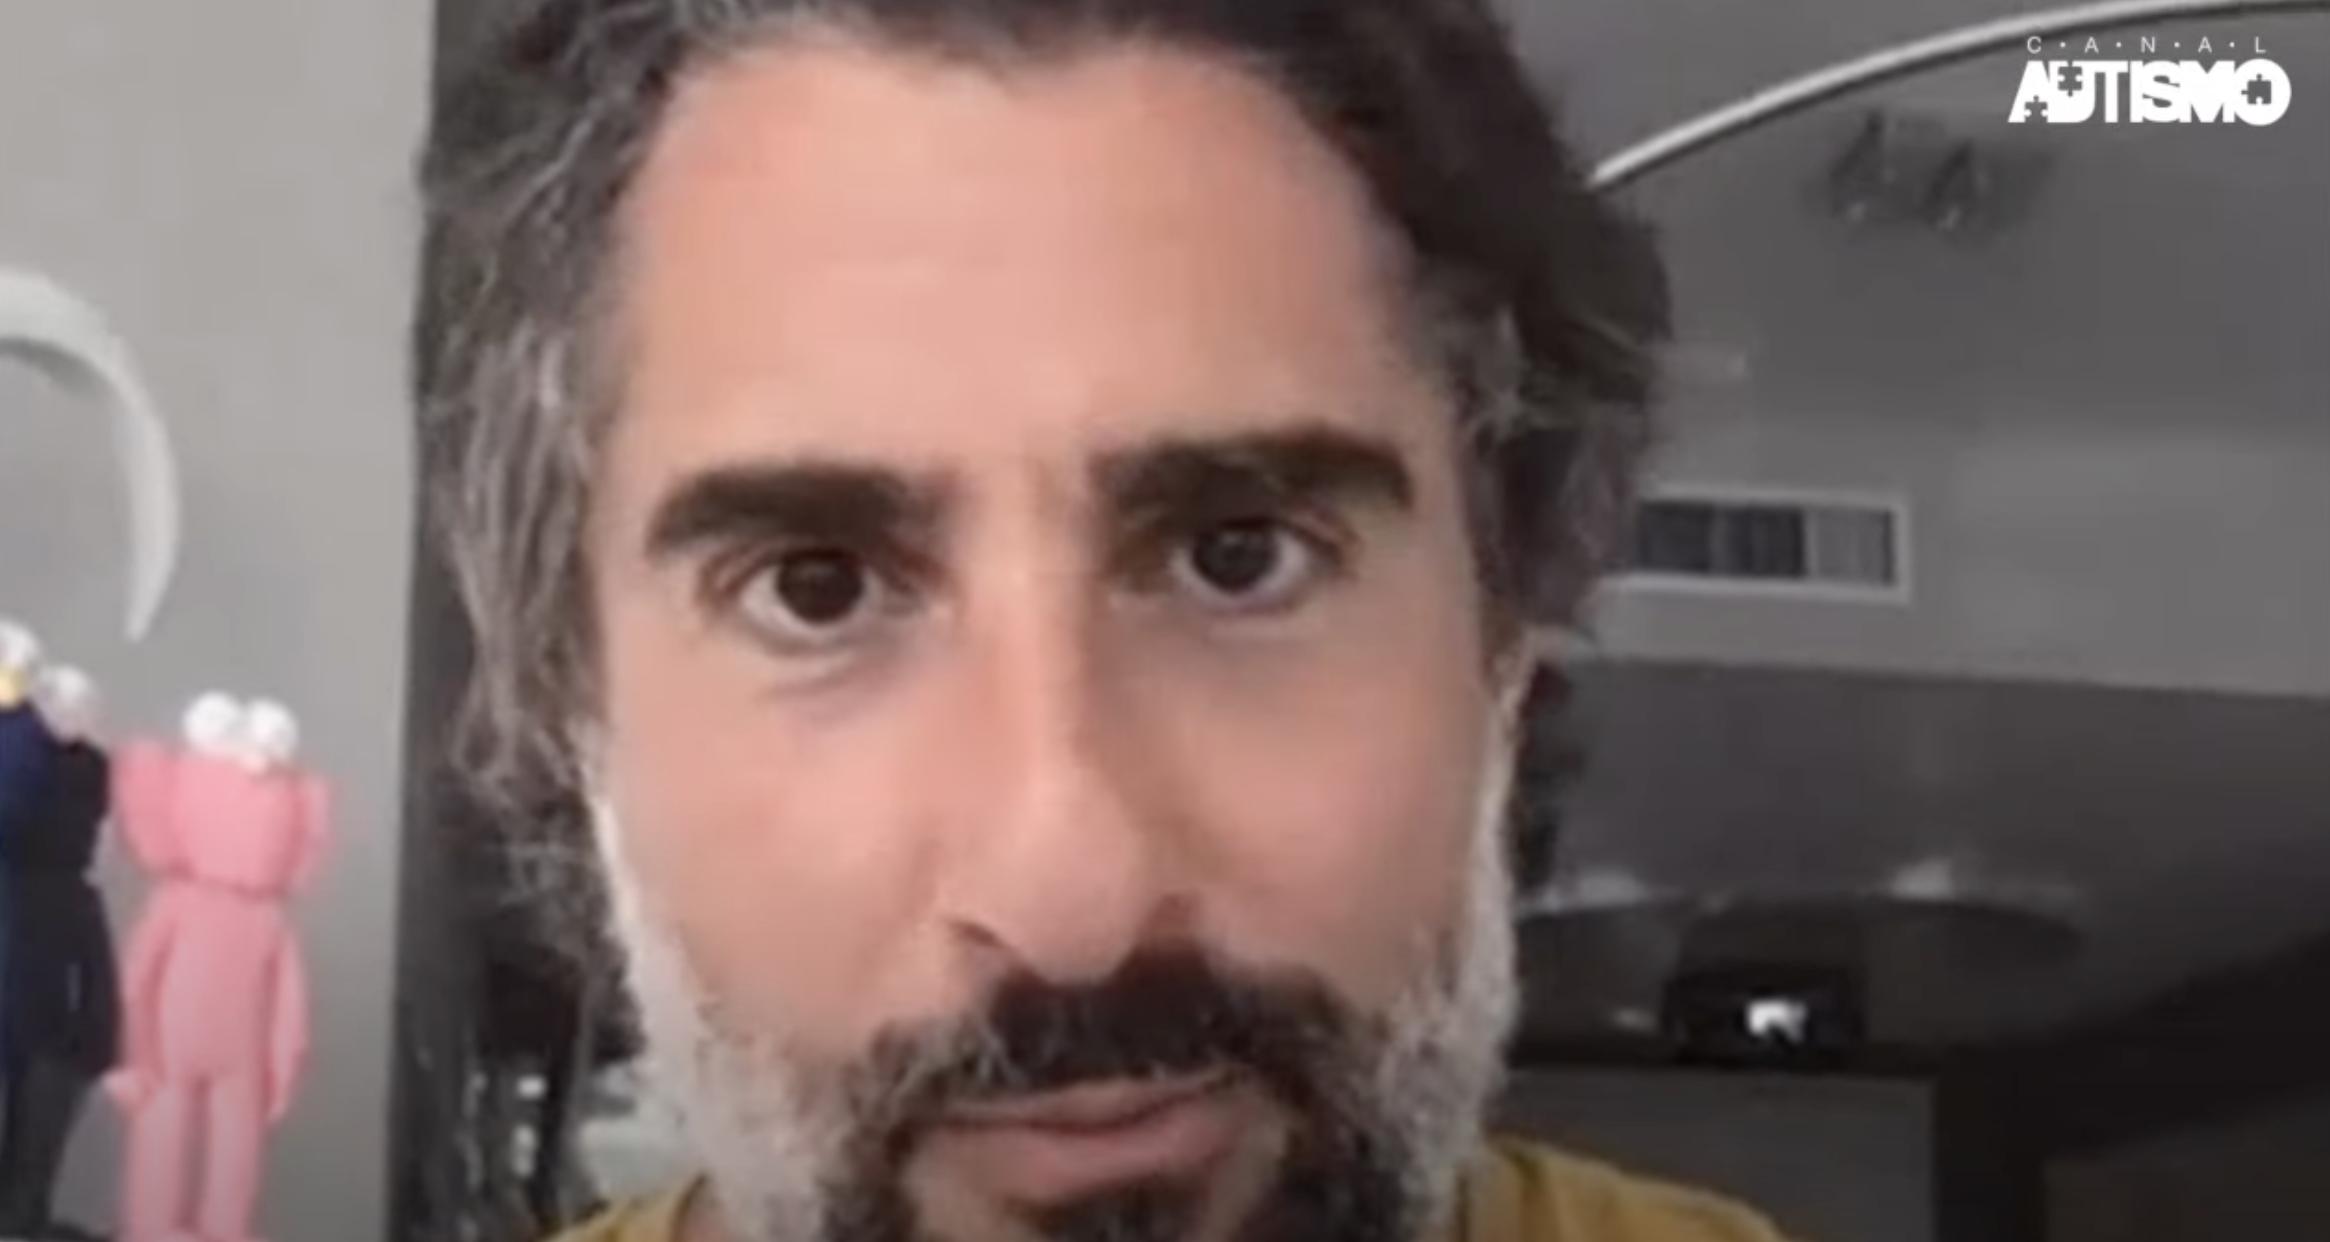 Entrevista exclusiva com Marcos Mion, o pai do Romeu — Francisco Paiva Junior — Canal Autismo / Revista Autismo - texto e vídeo